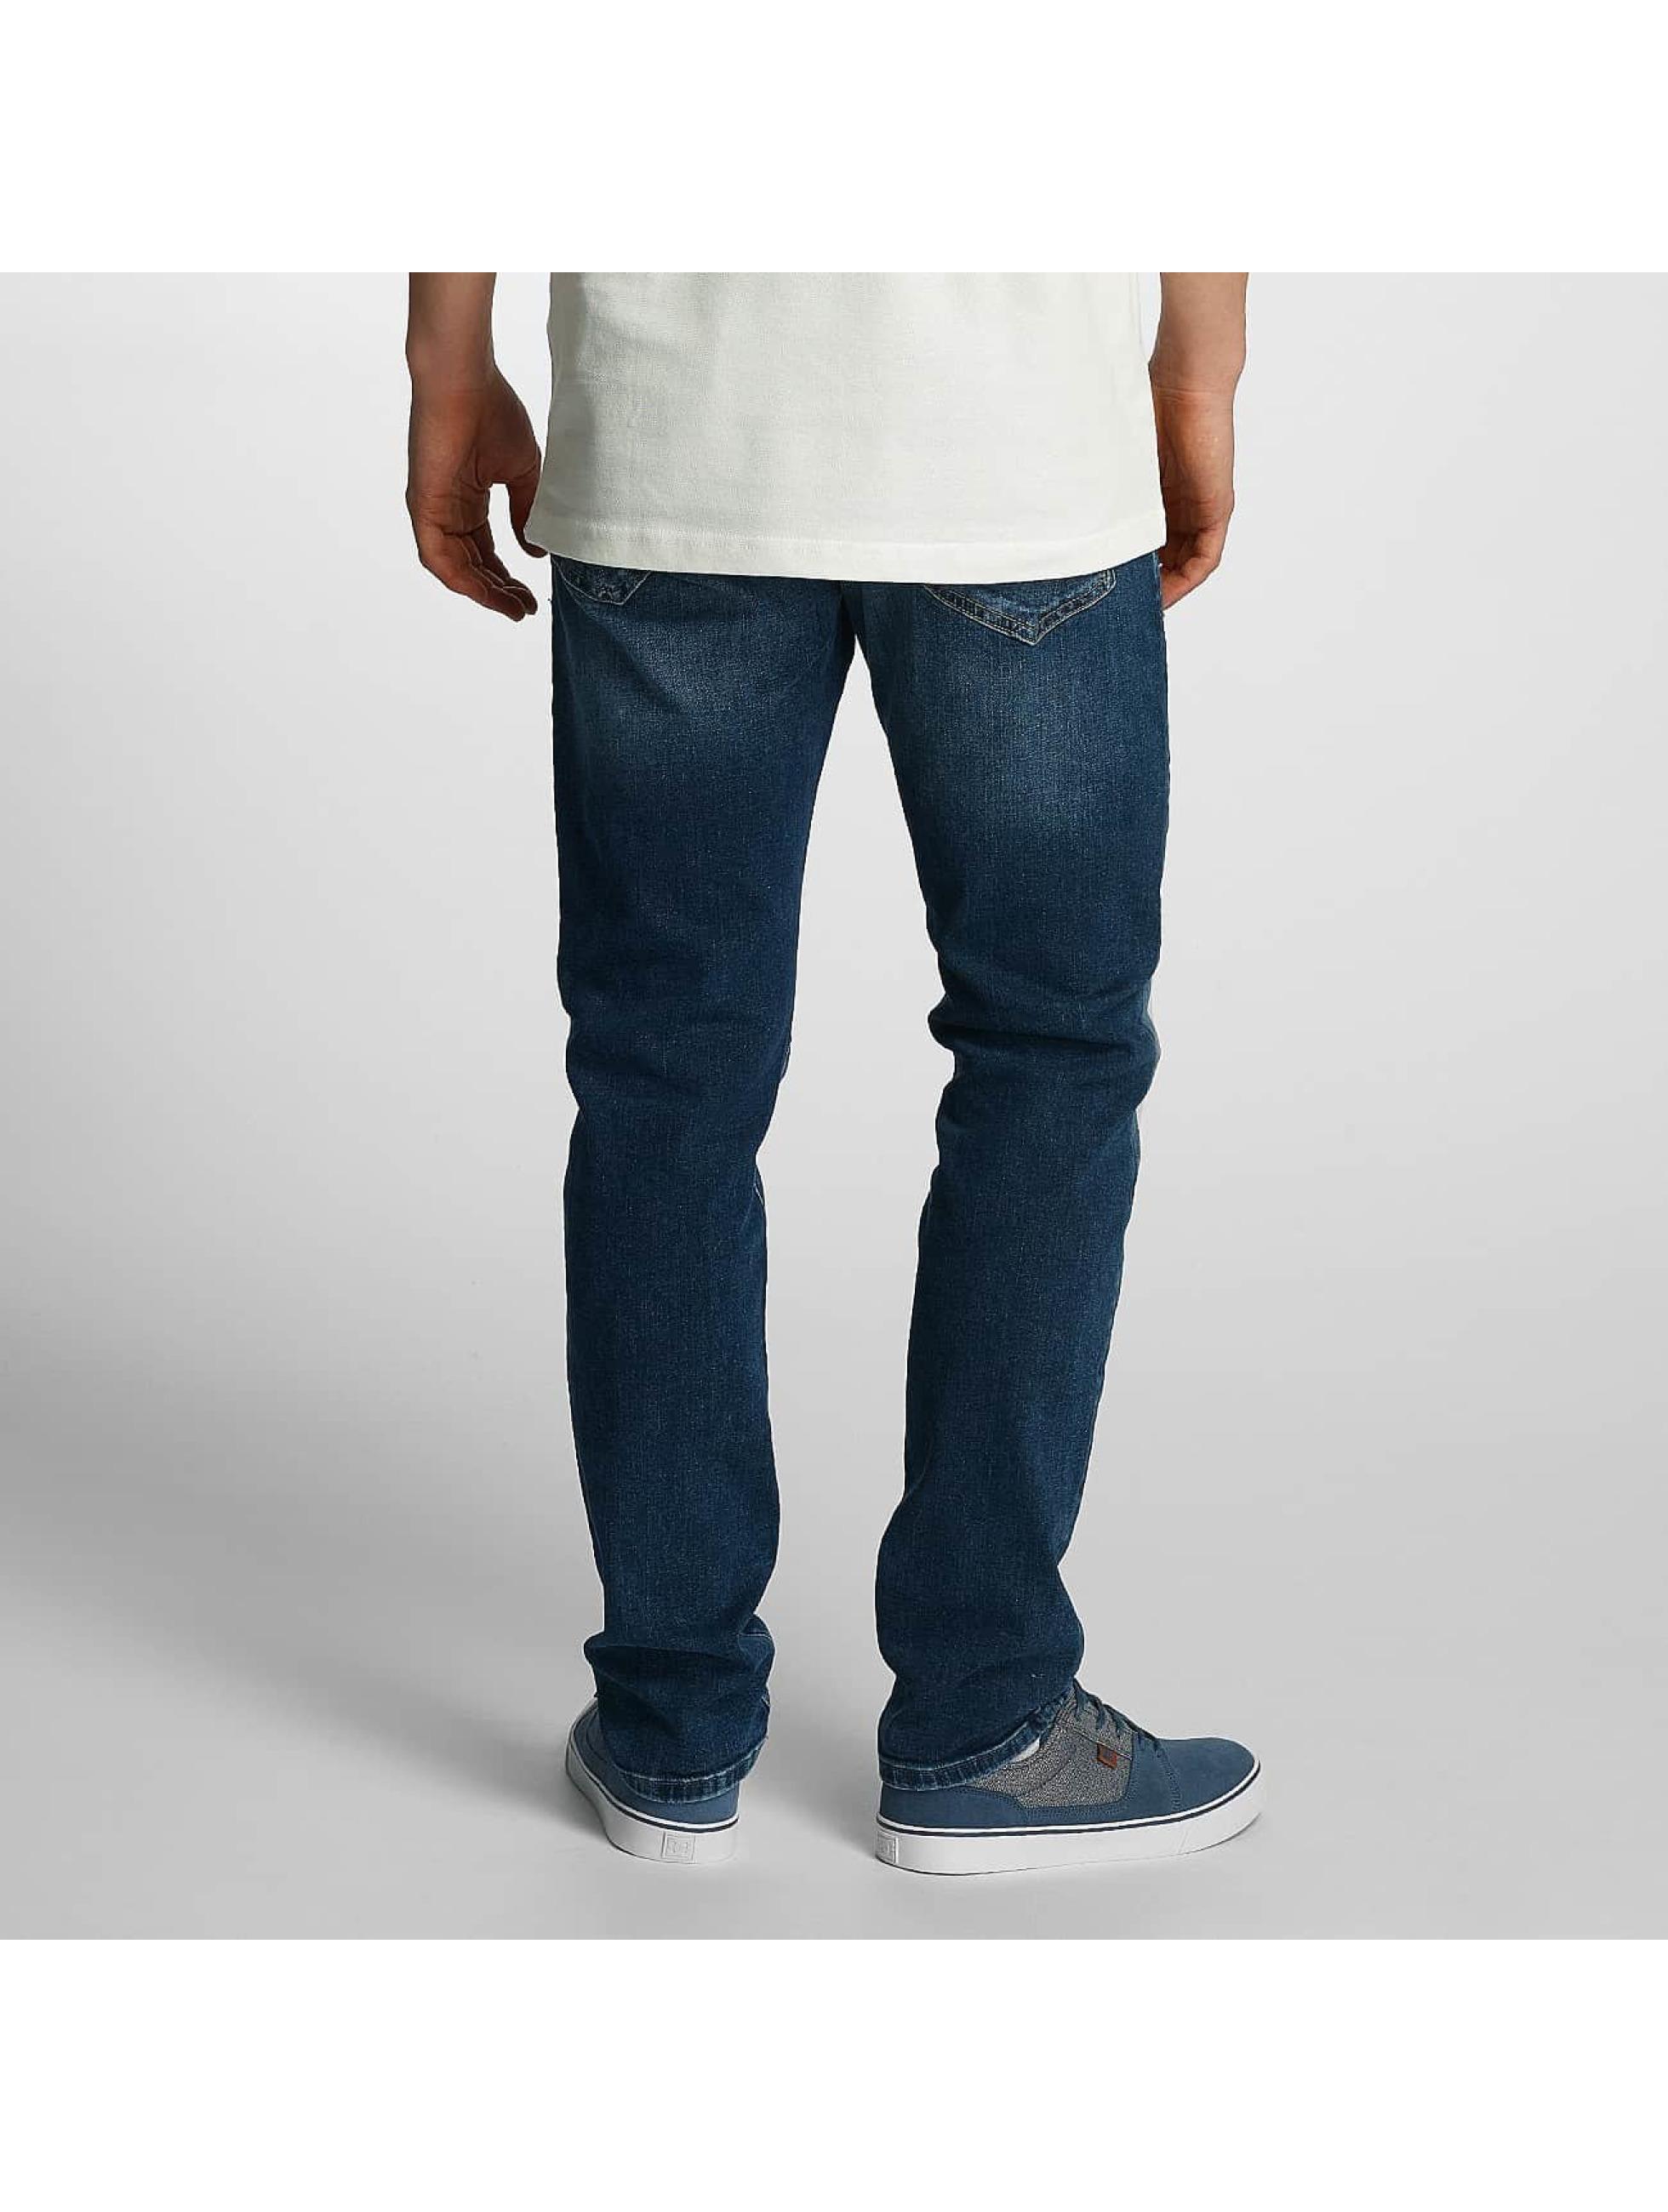 Mavi Jeans Slim Fit Jeans Yves blue